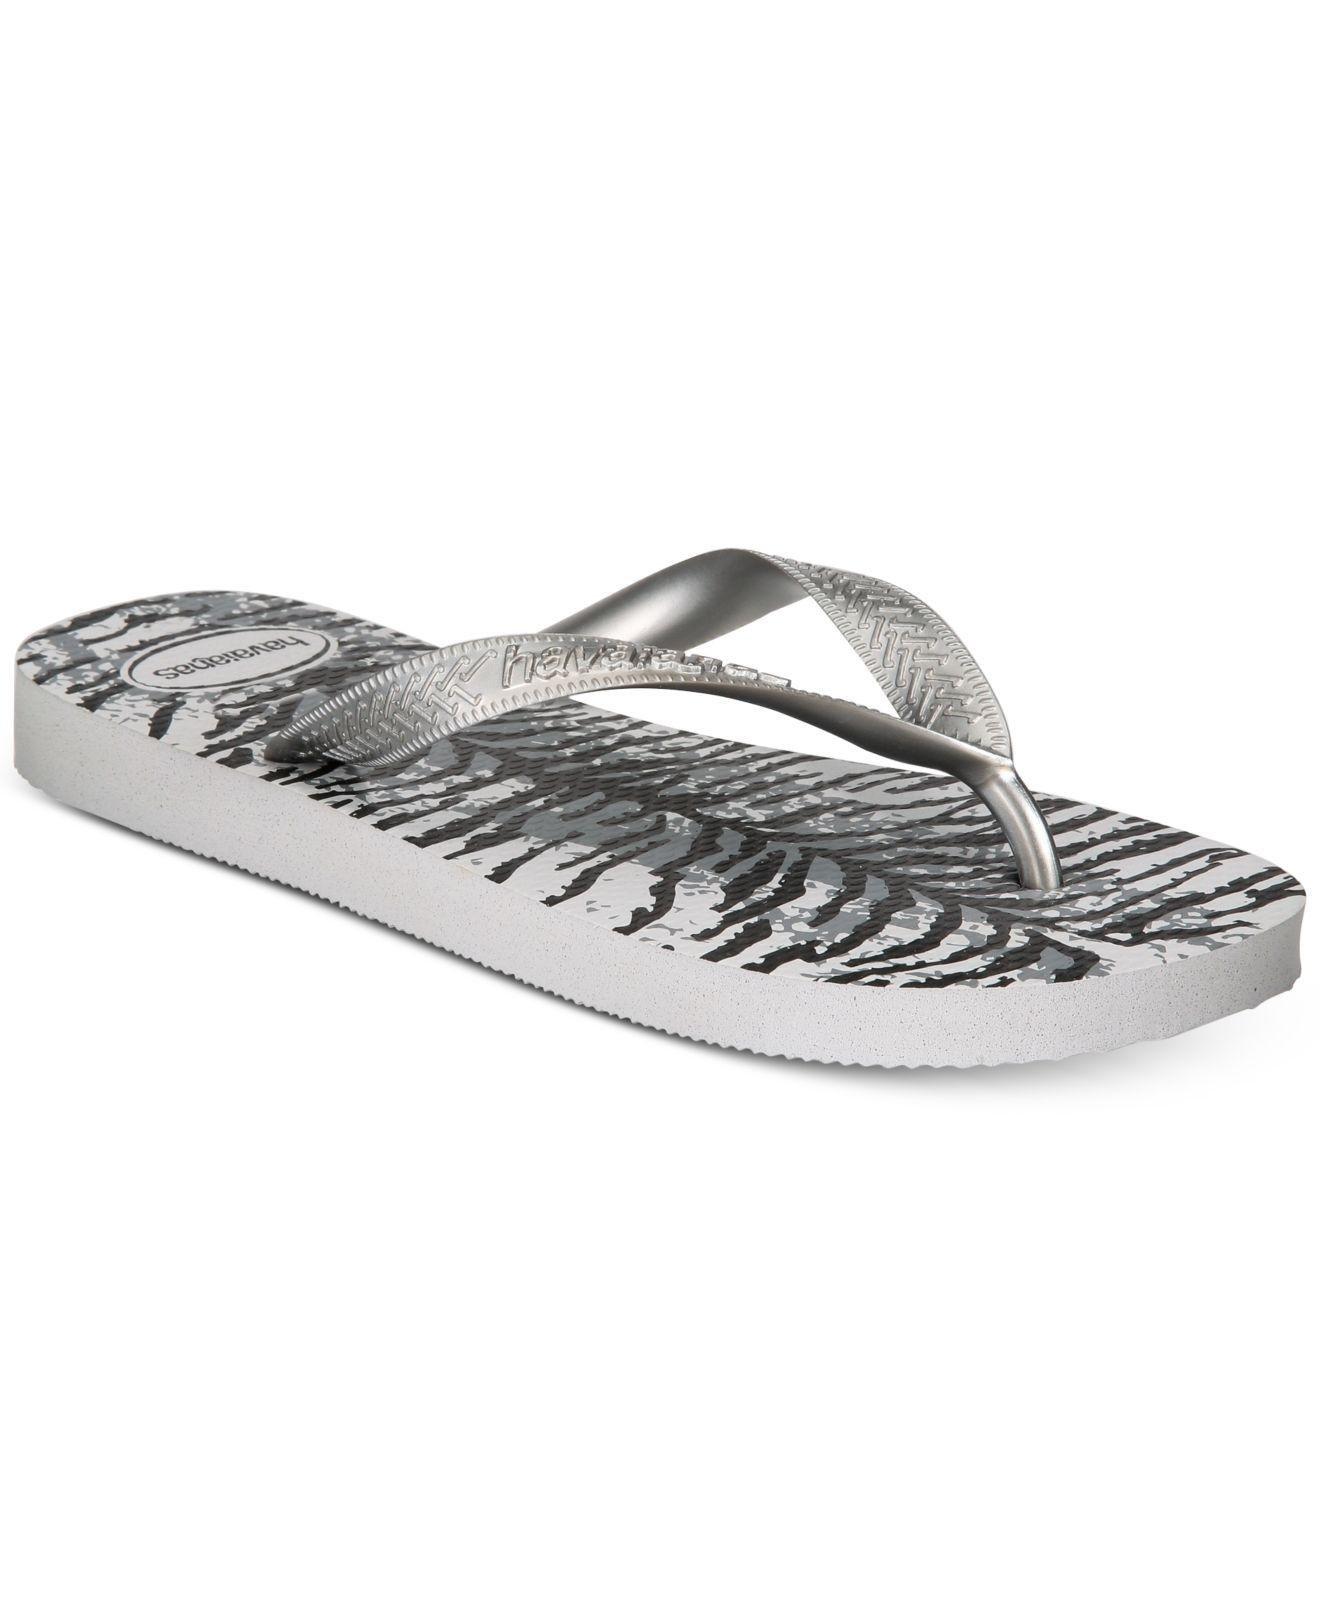 53bafc61f Havaianas. Women s Gray Top Animal Flip-flop Sandals ...